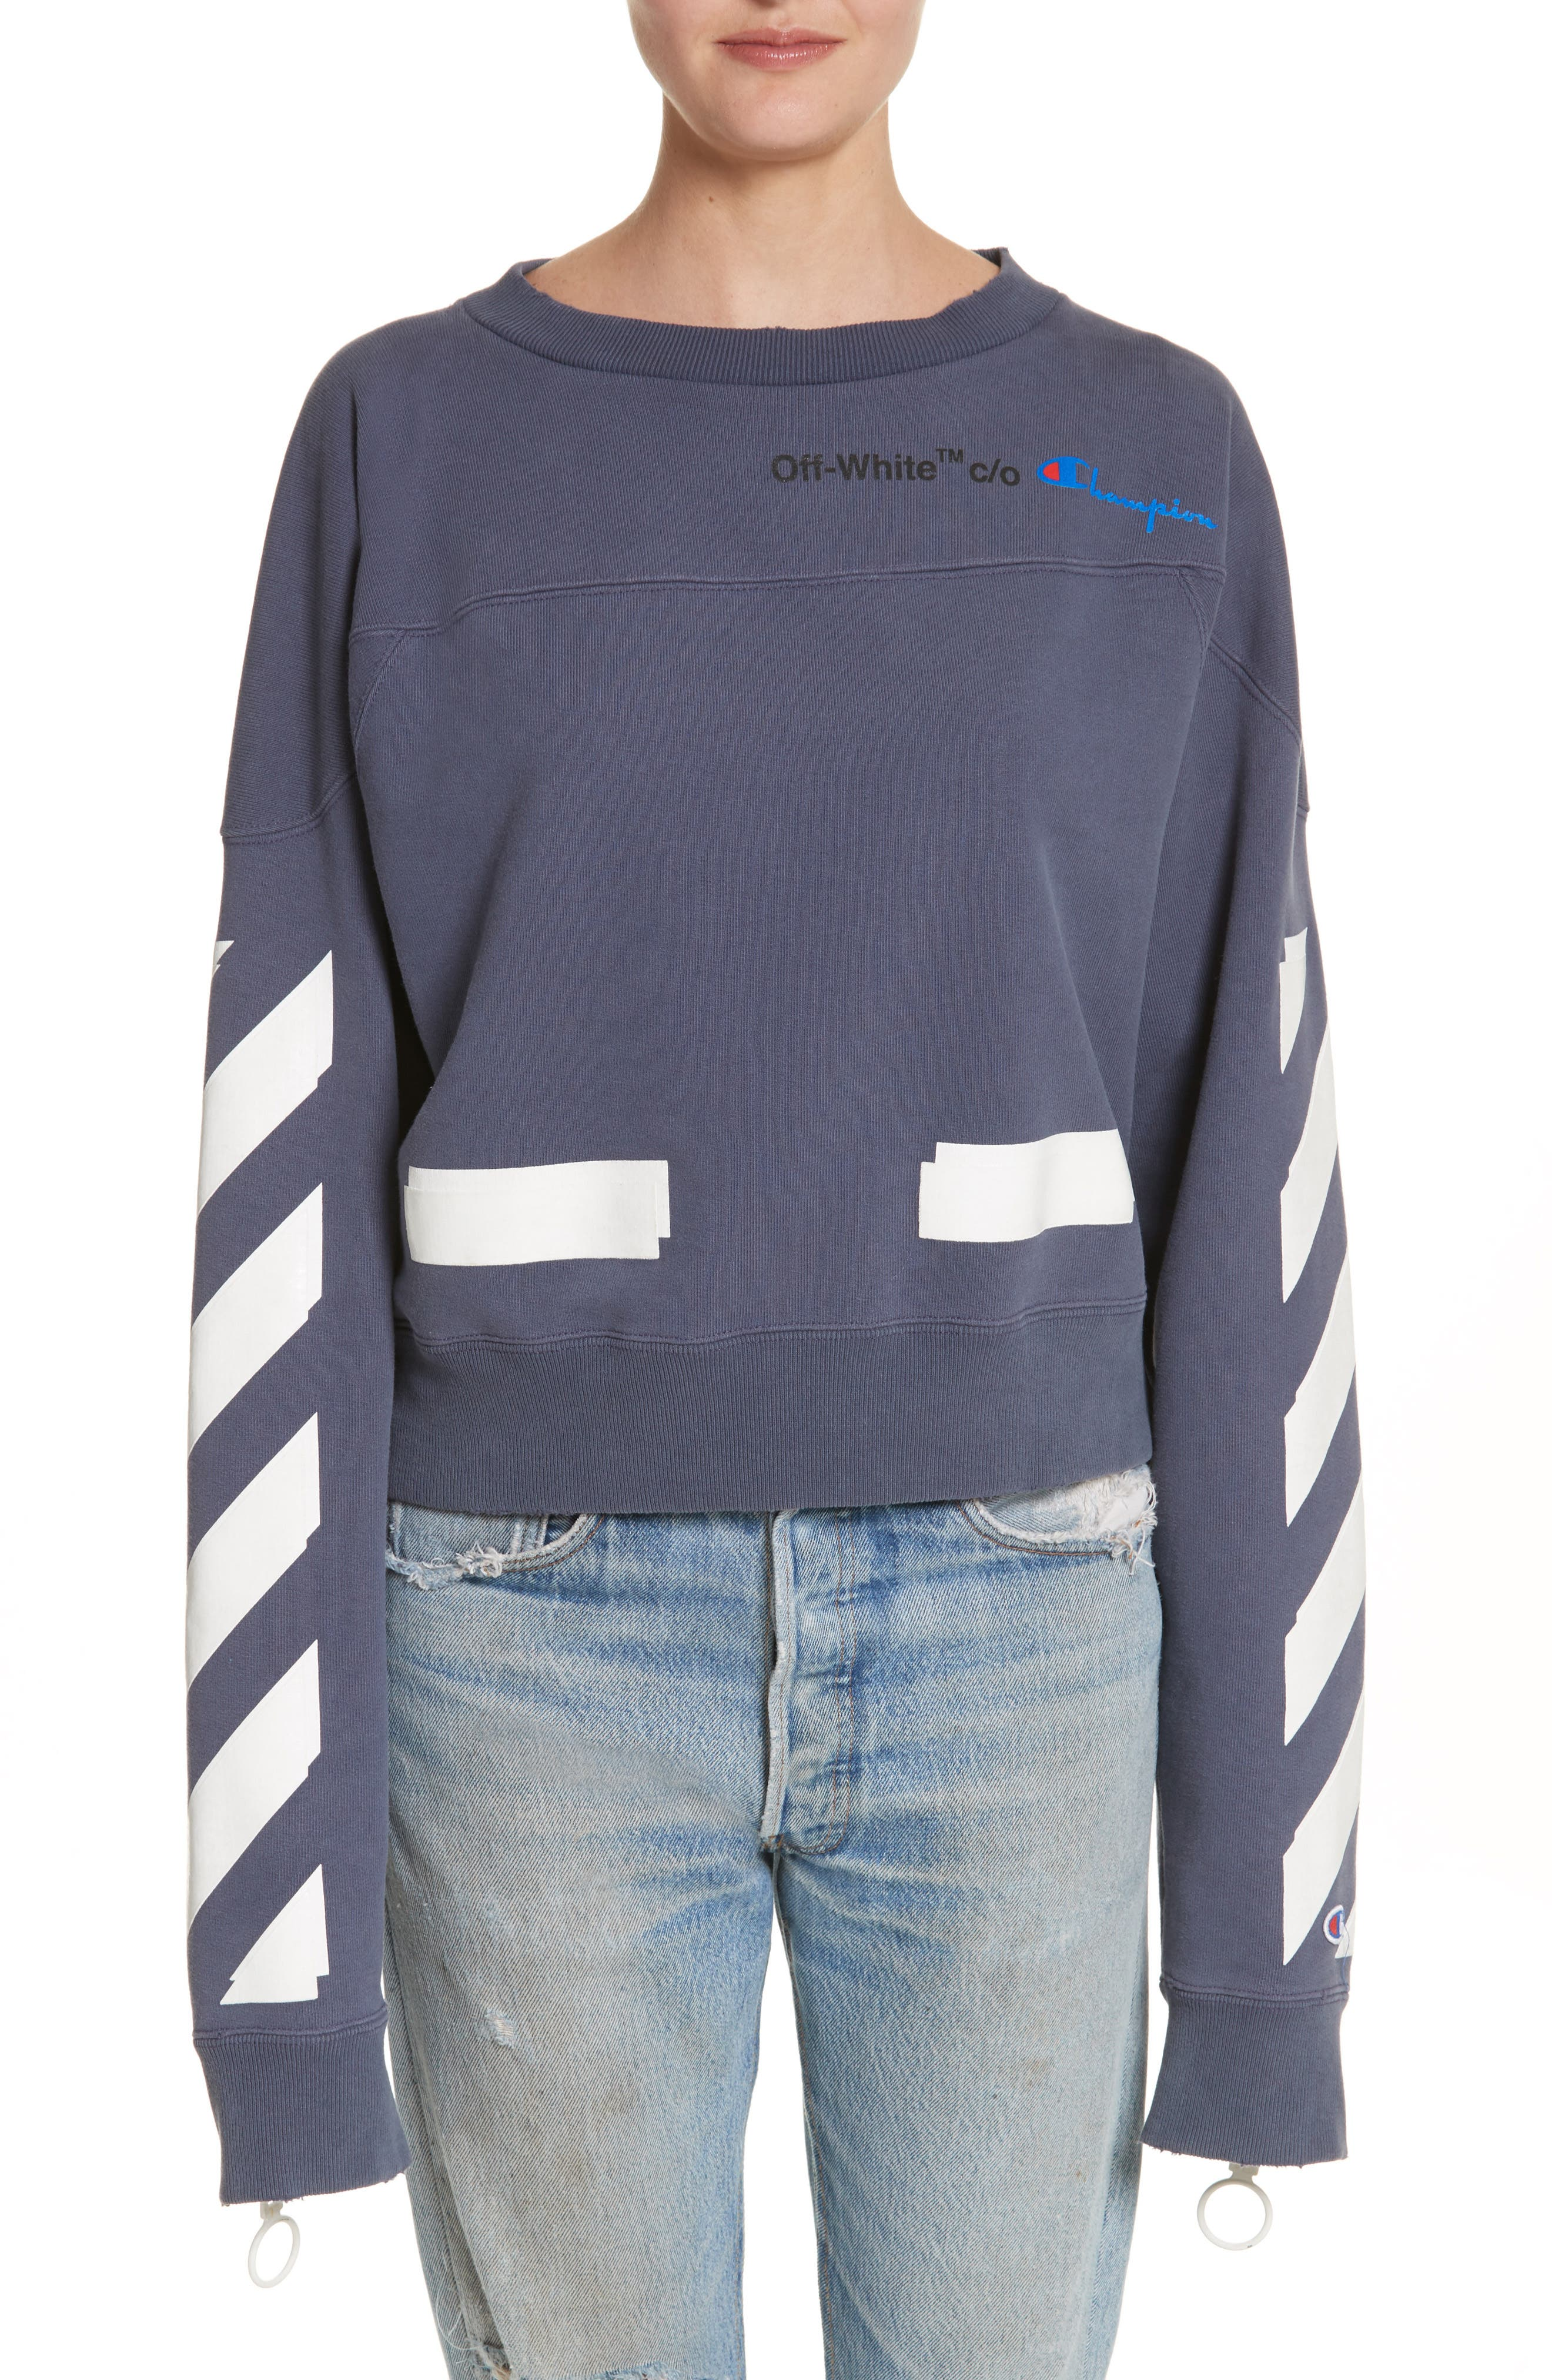 Off-White x Champion Crewneck Sweatshirt